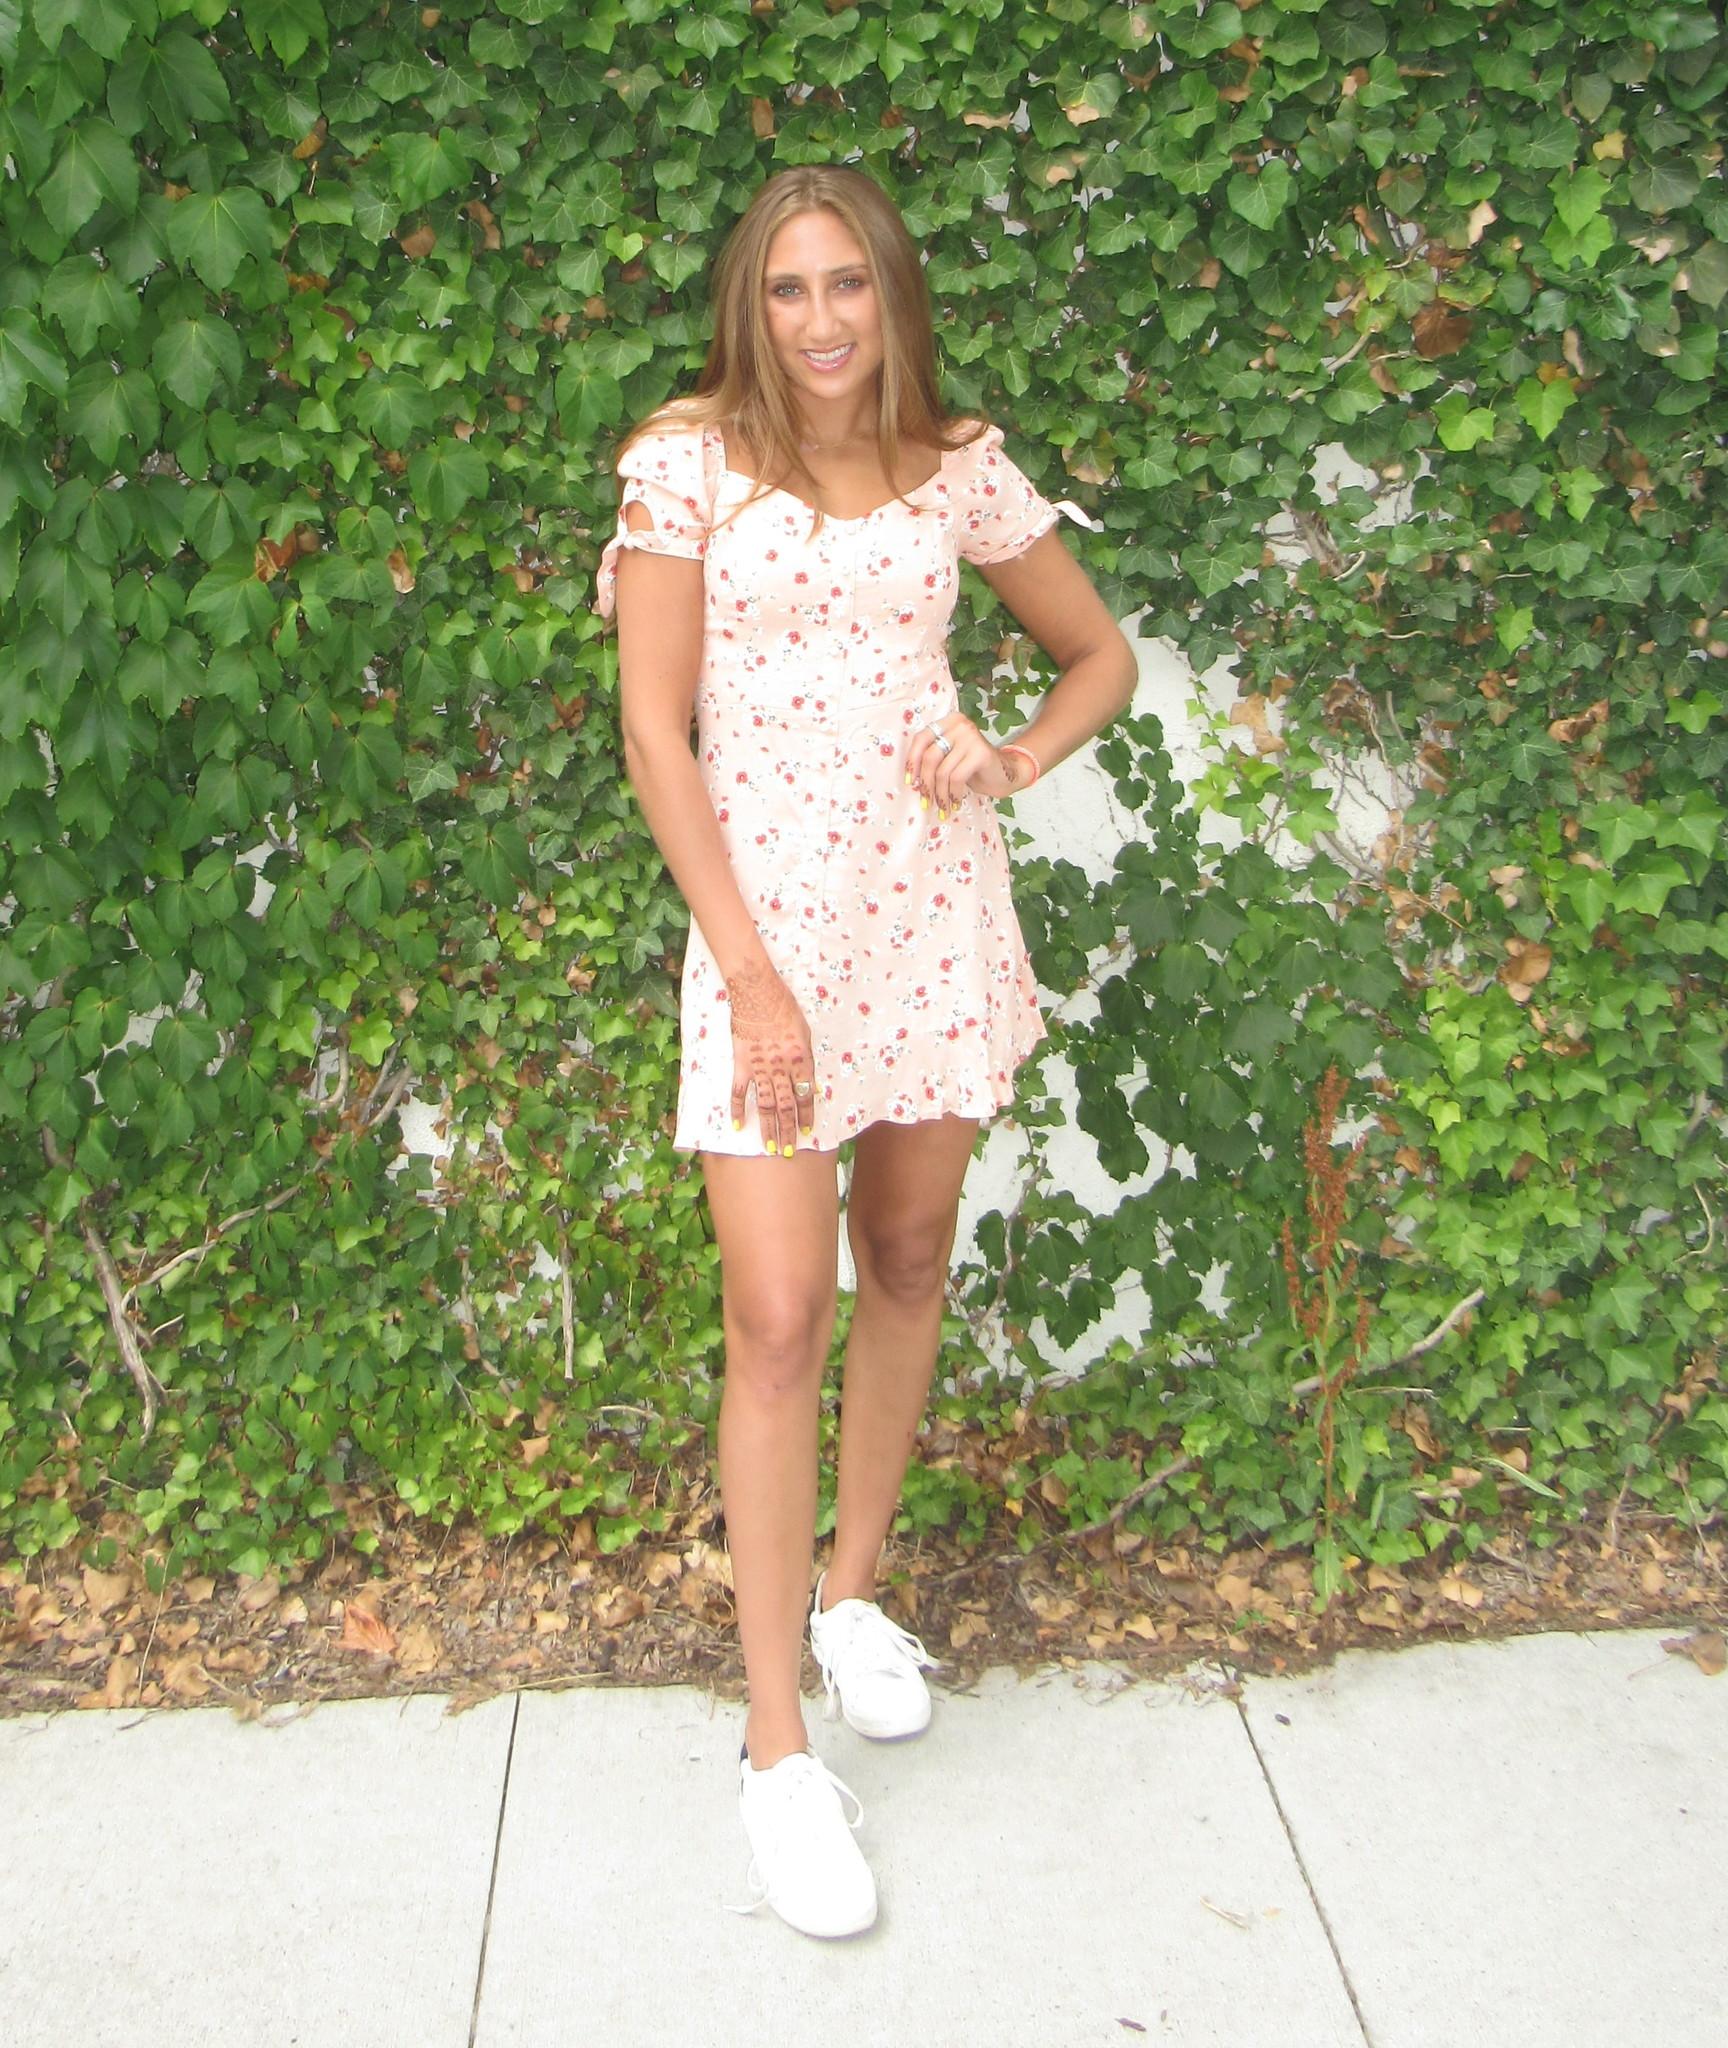 LEXI DREW Pink Floral Dress